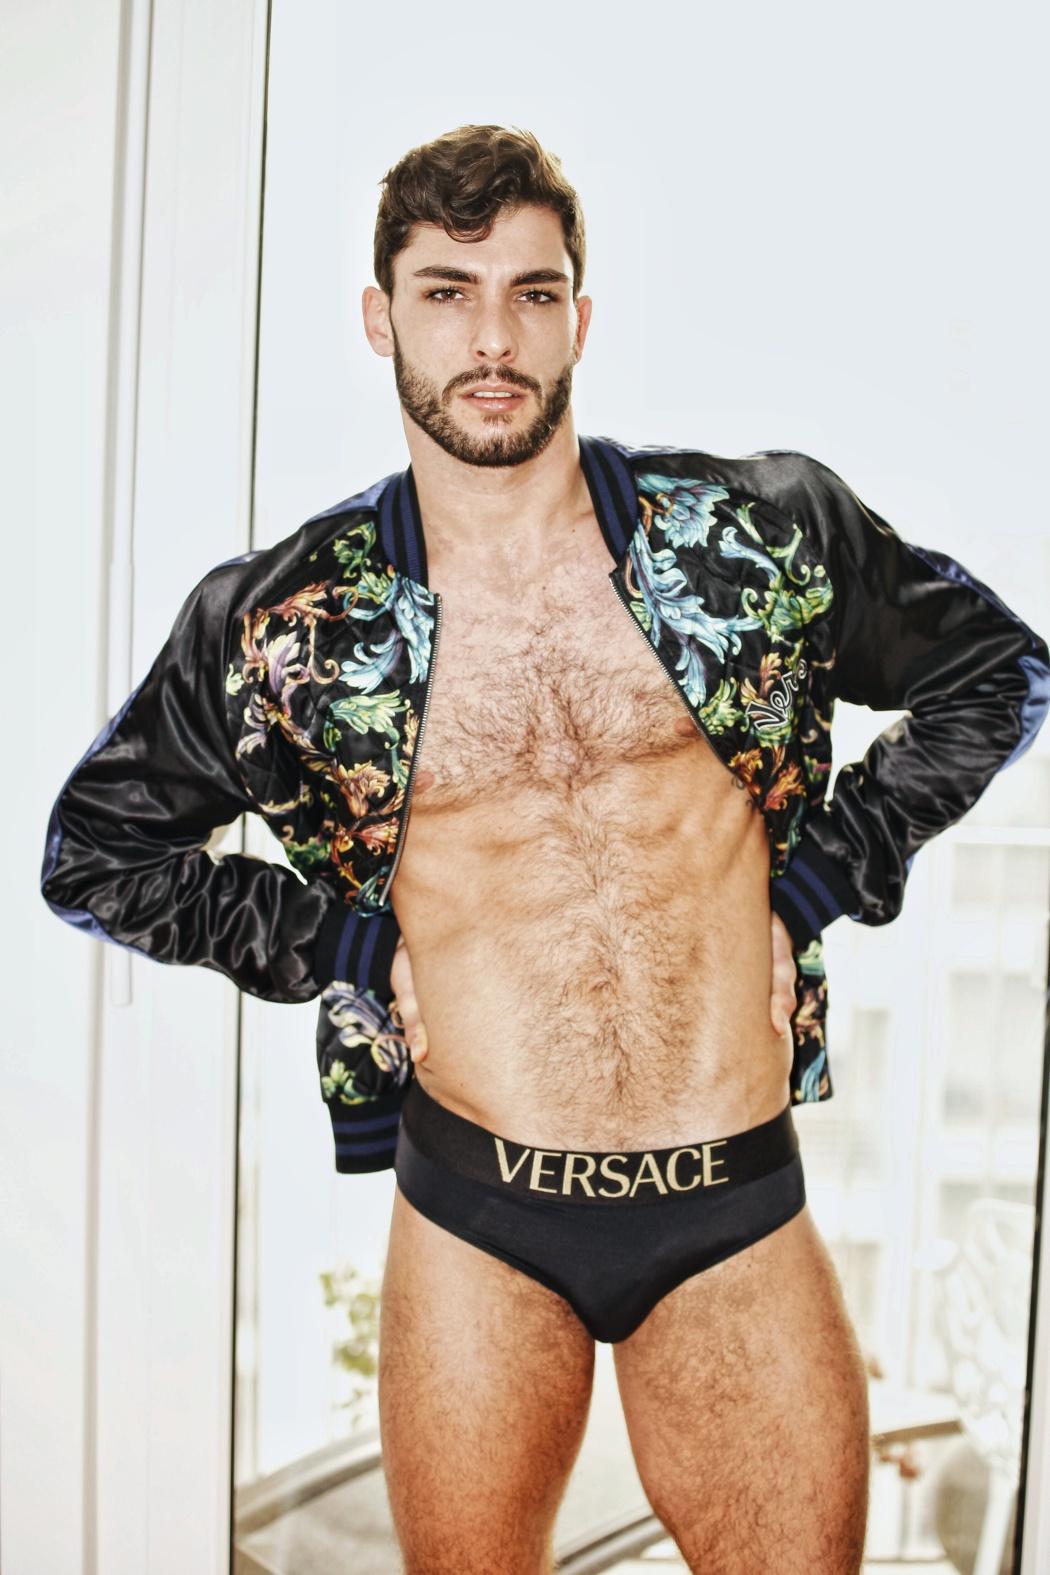 Paolo Busti - Versace swimwear kaltblut magazine